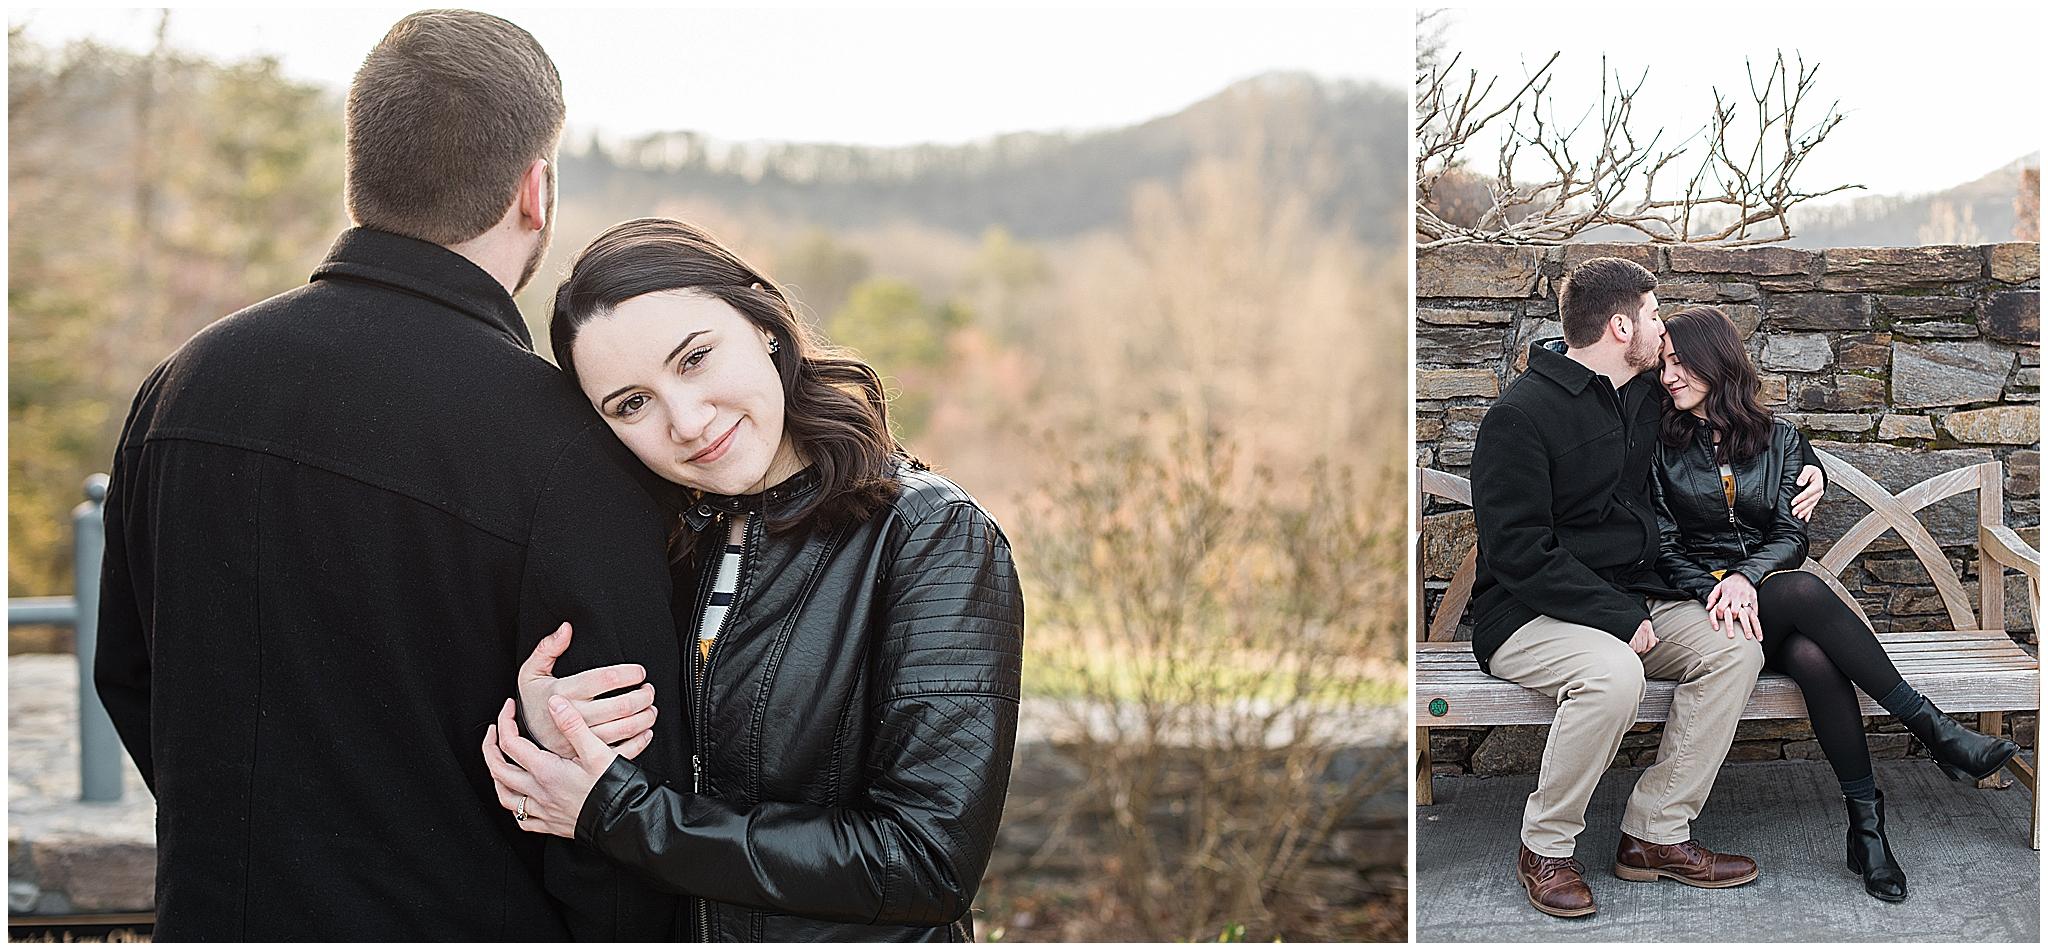 Wedding_Photographer_Asheville_engagement_Arboretum_0002.jpg